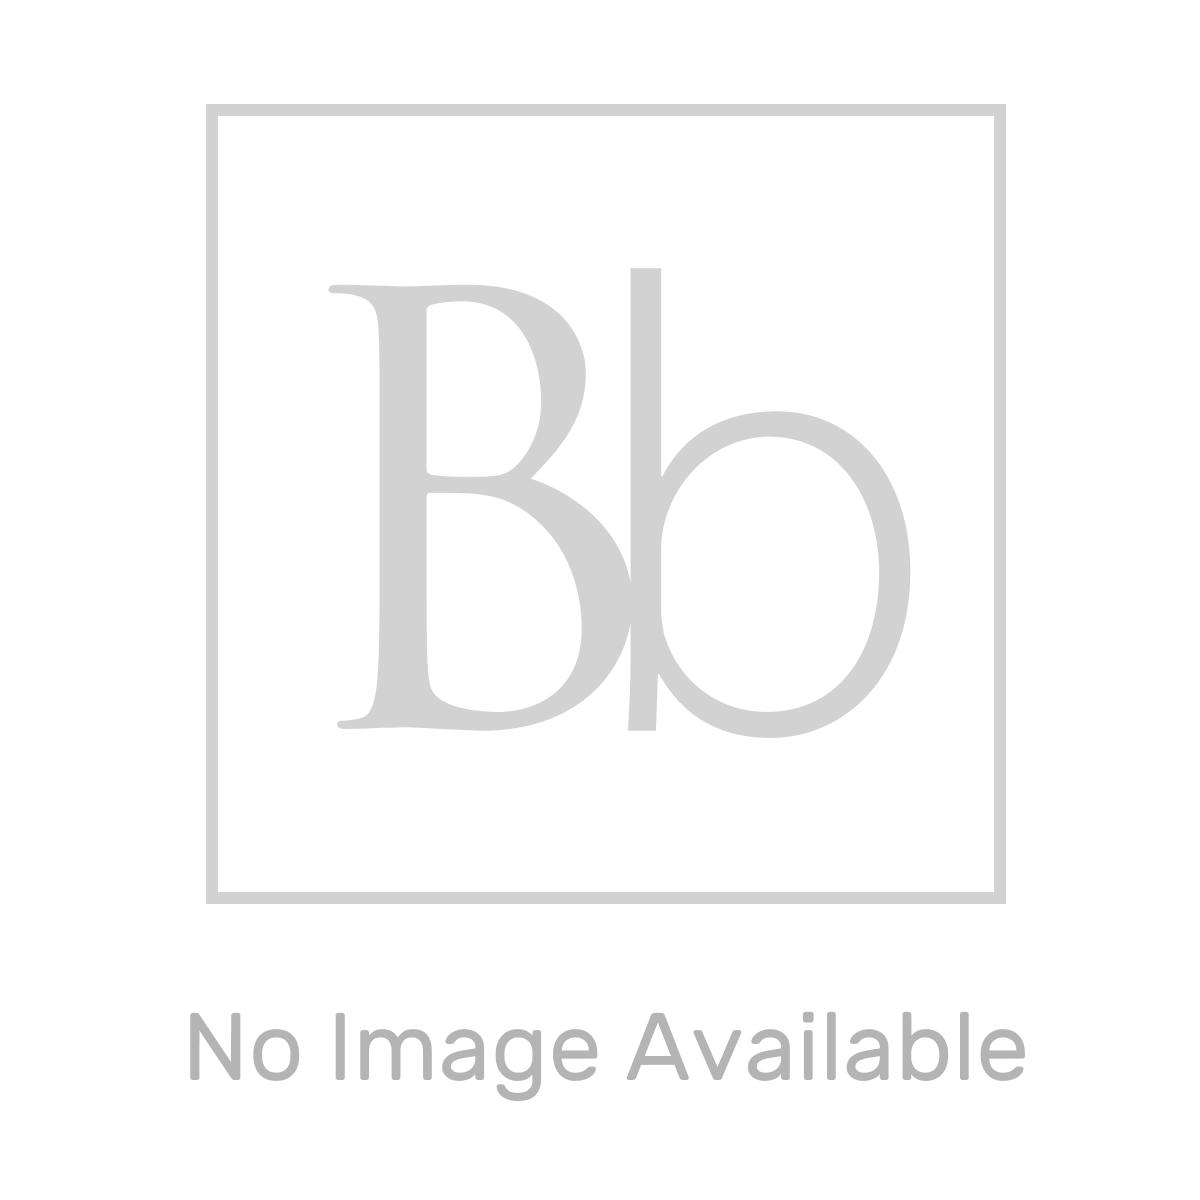 Aquadart White Slate Shower Tray 1000 x 900mm Dimensions